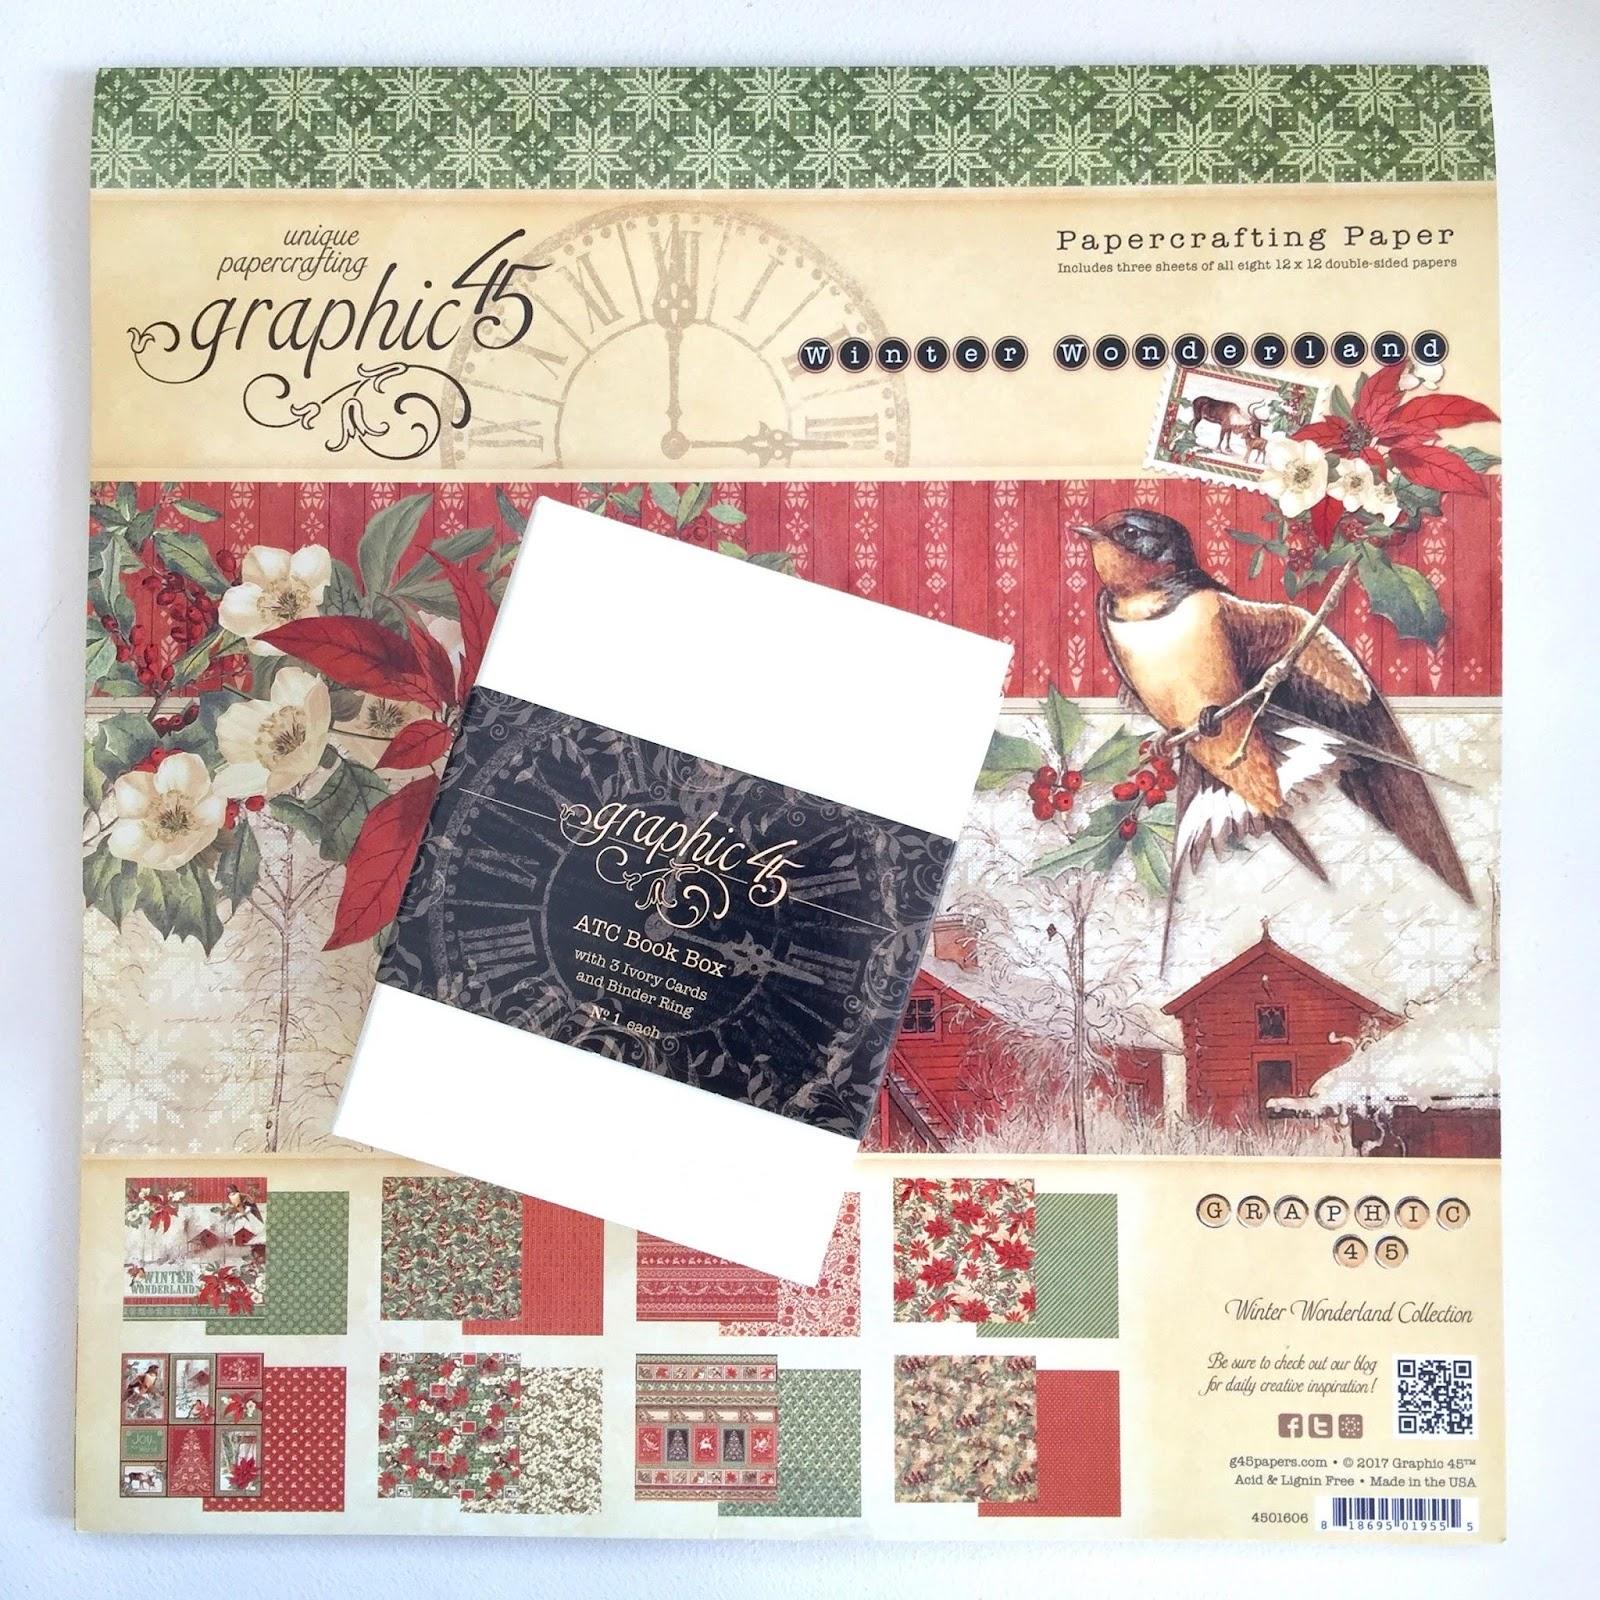 Winter Wonderland Book Box by Marina Blaukitchen Product by Graphic 45 photo 10.jpg